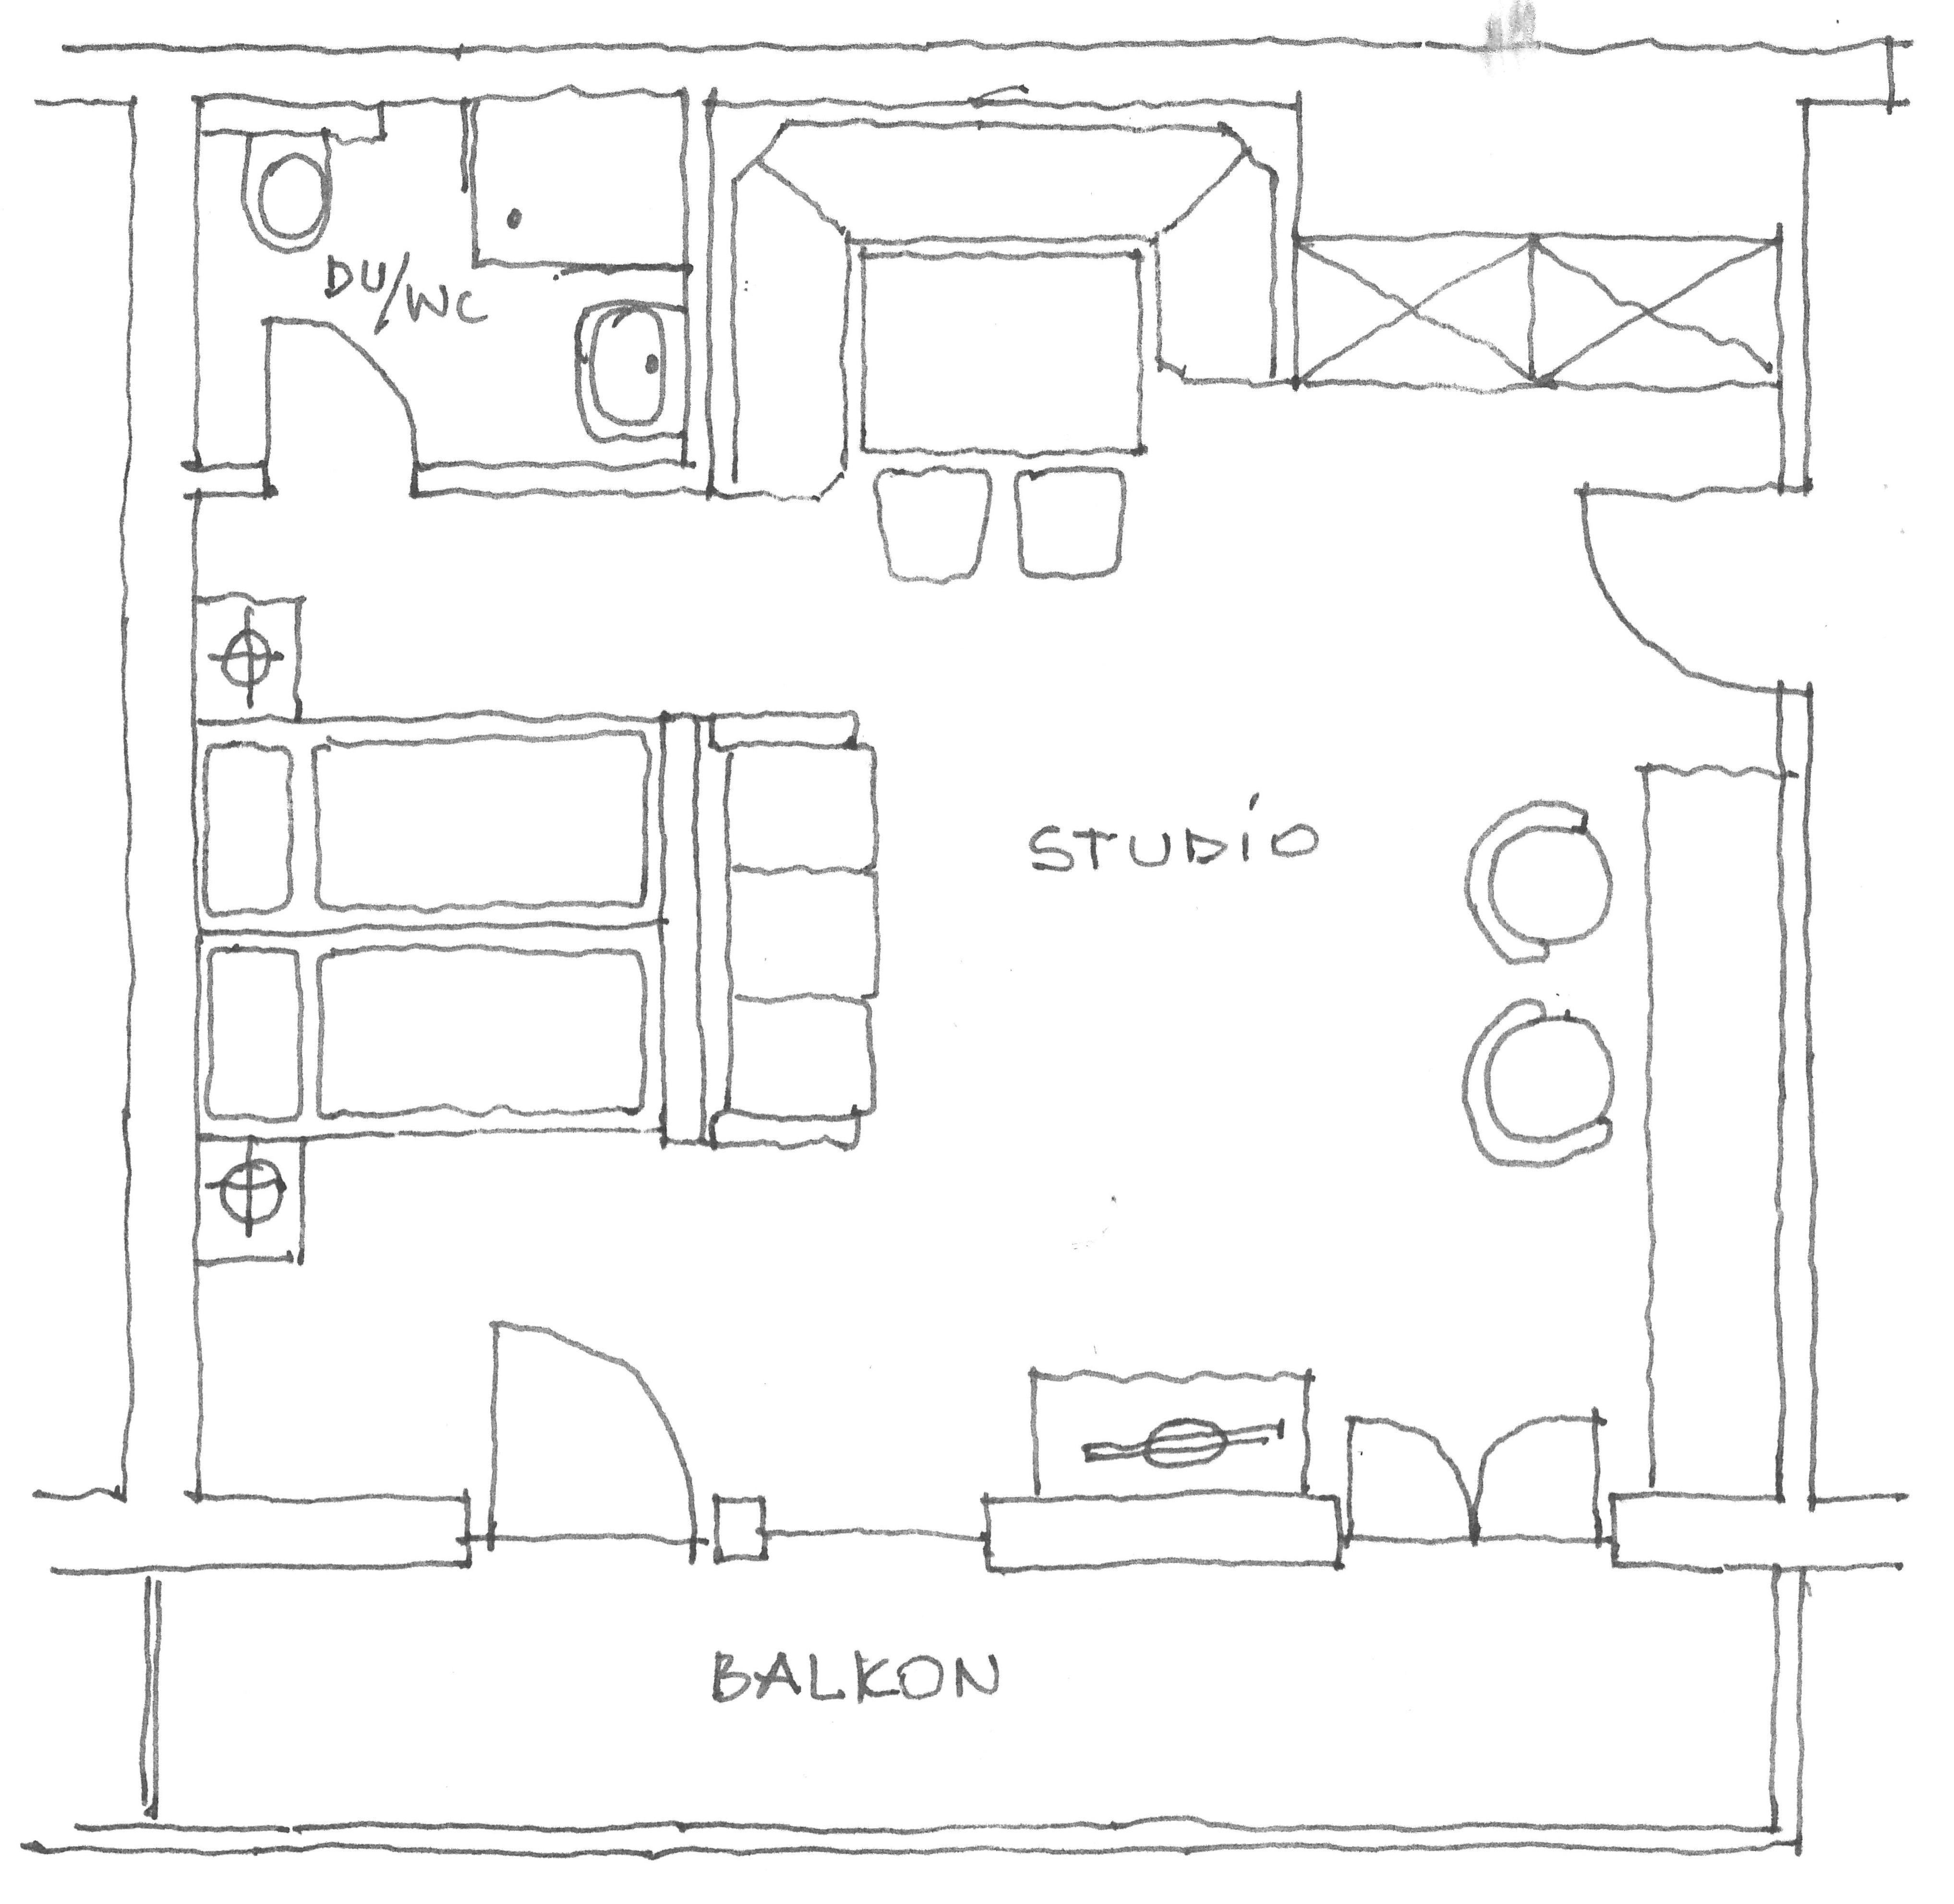 Grundriss Studio Zirbenstube 40 m²